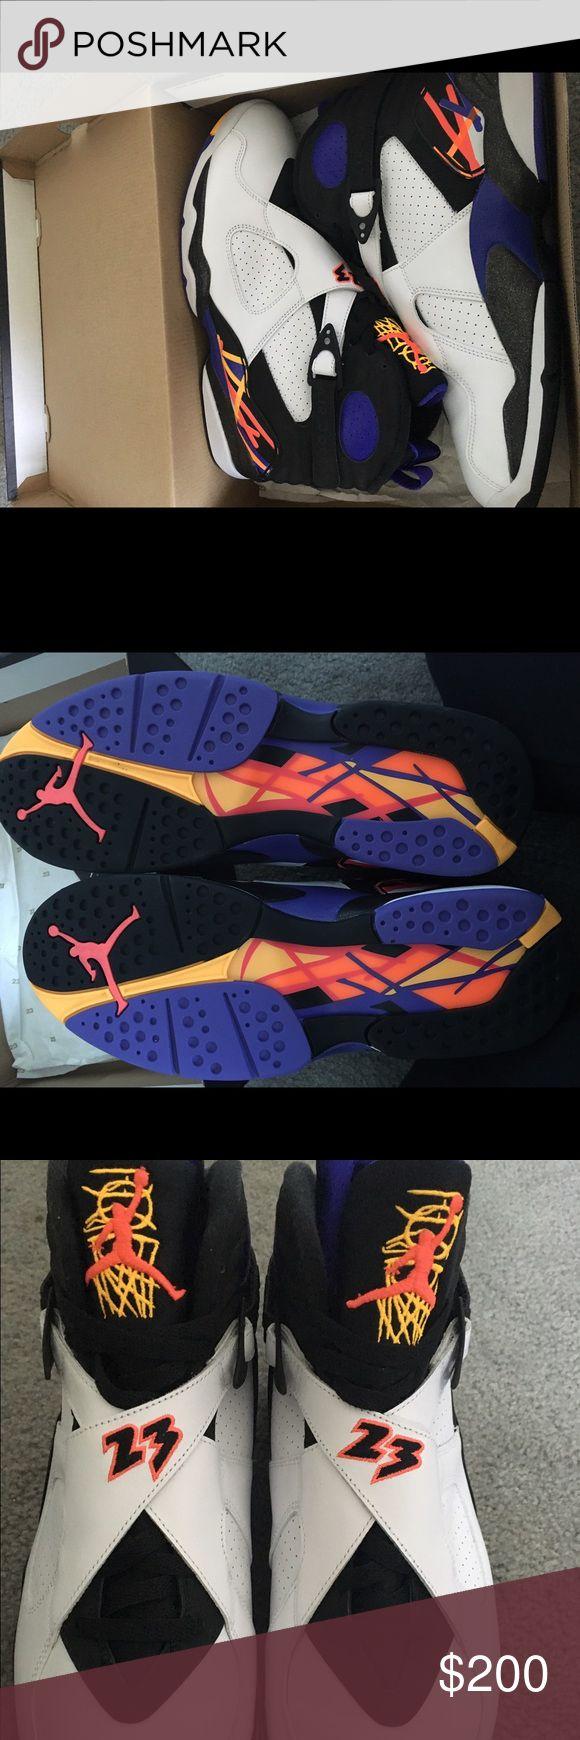 Air Jordan 8 Retro Very light wear, have box Jordan Shoes Sneakers